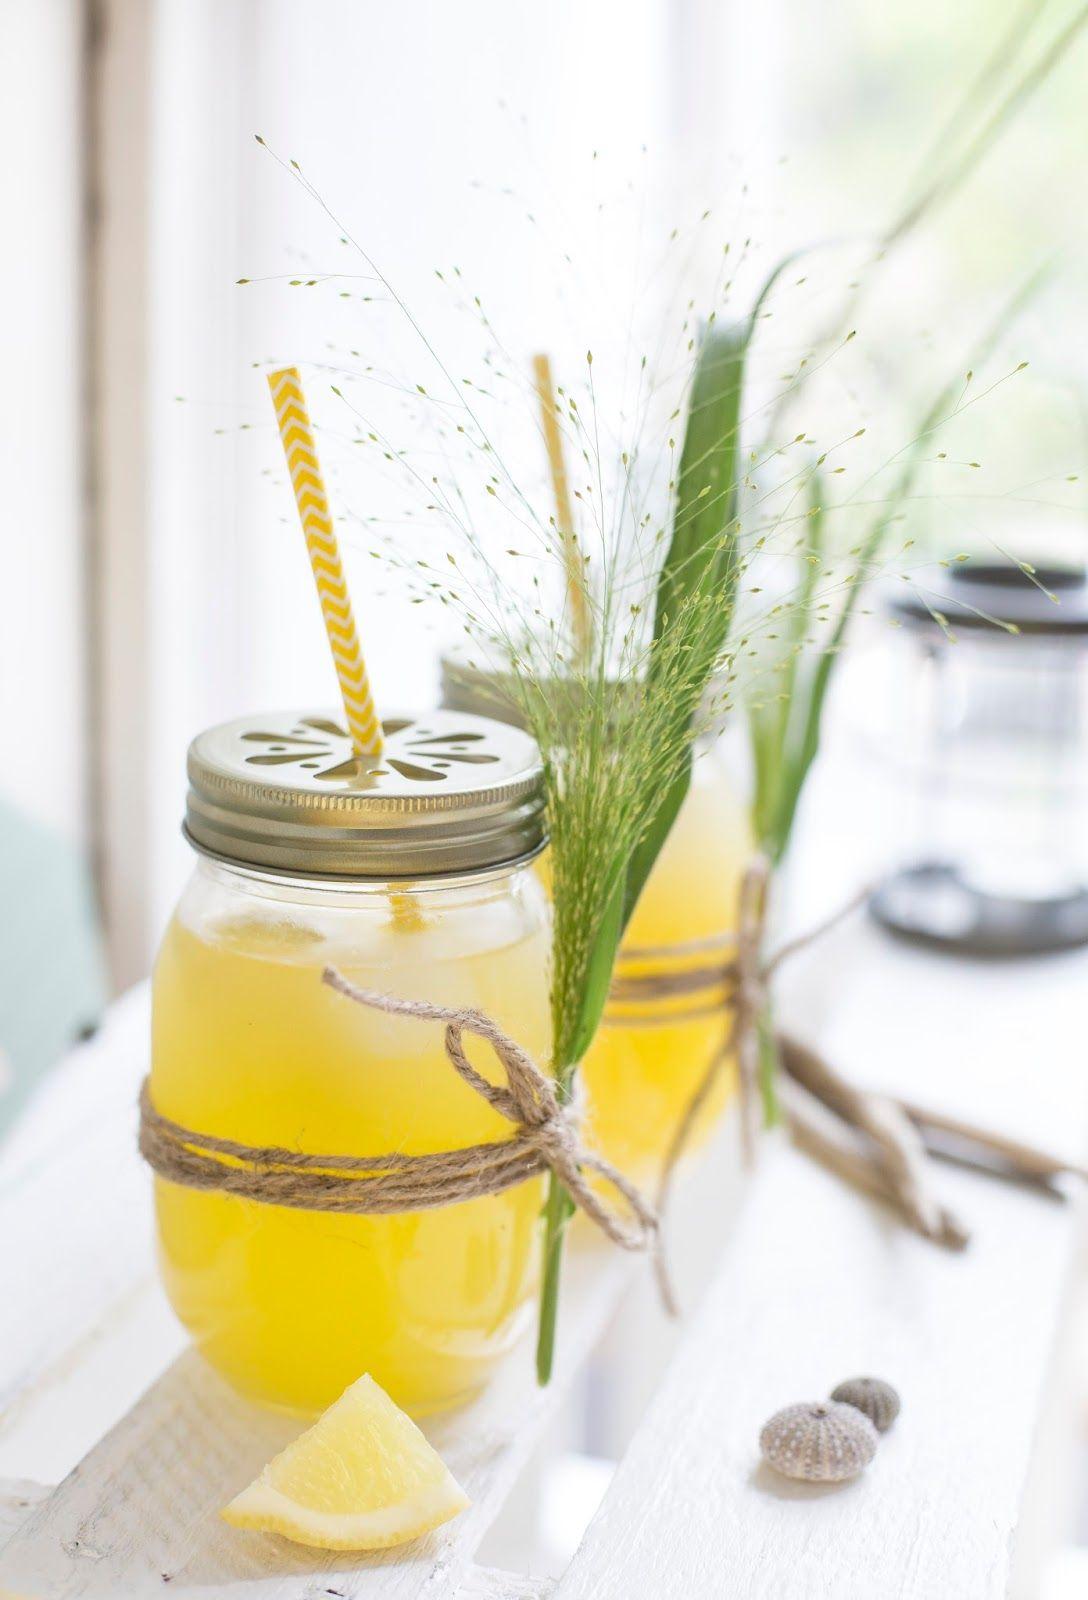 die besten 25 limonade rezept ideen auf pinterest limonaden zitronen eistee und zitronen. Black Bedroom Furniture Sets. Home Design Ideas